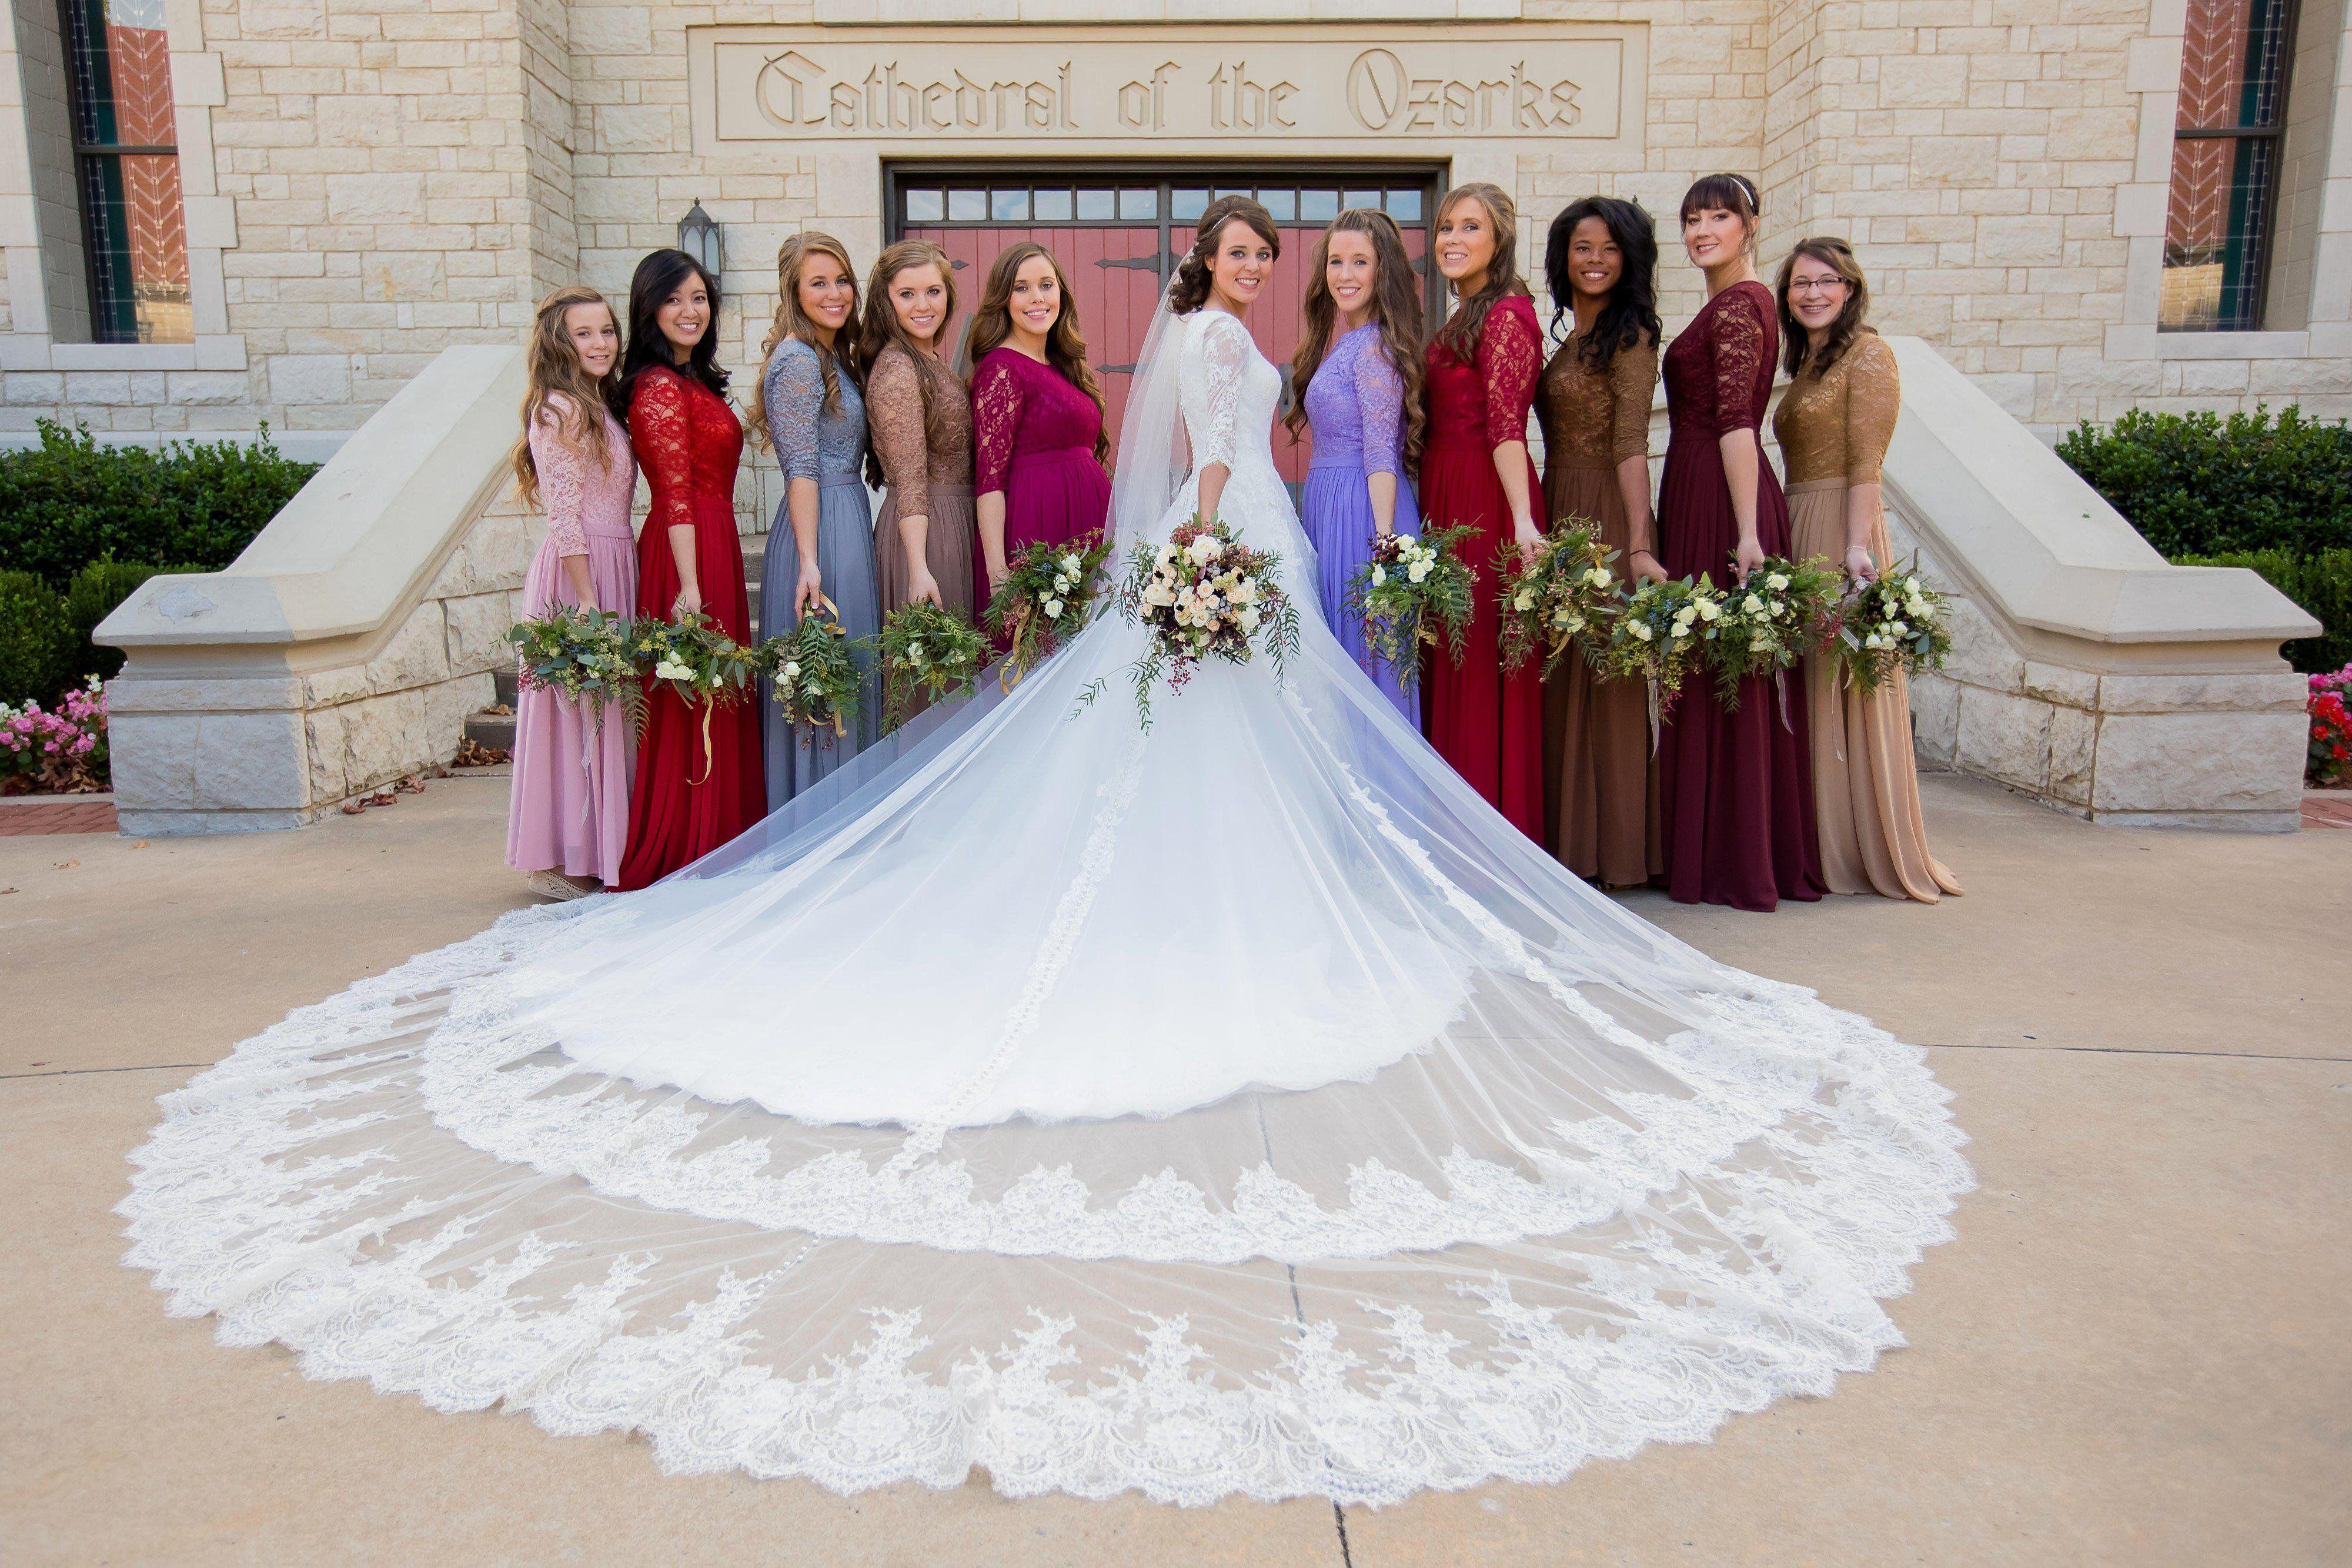 Jinger Duggar Wedding Dress Designer Elegant Tlc Wedding Dress Fashion Dresses Jinger Duggar Wedding Duggar Wedding Joy Anna Duggar Wedding